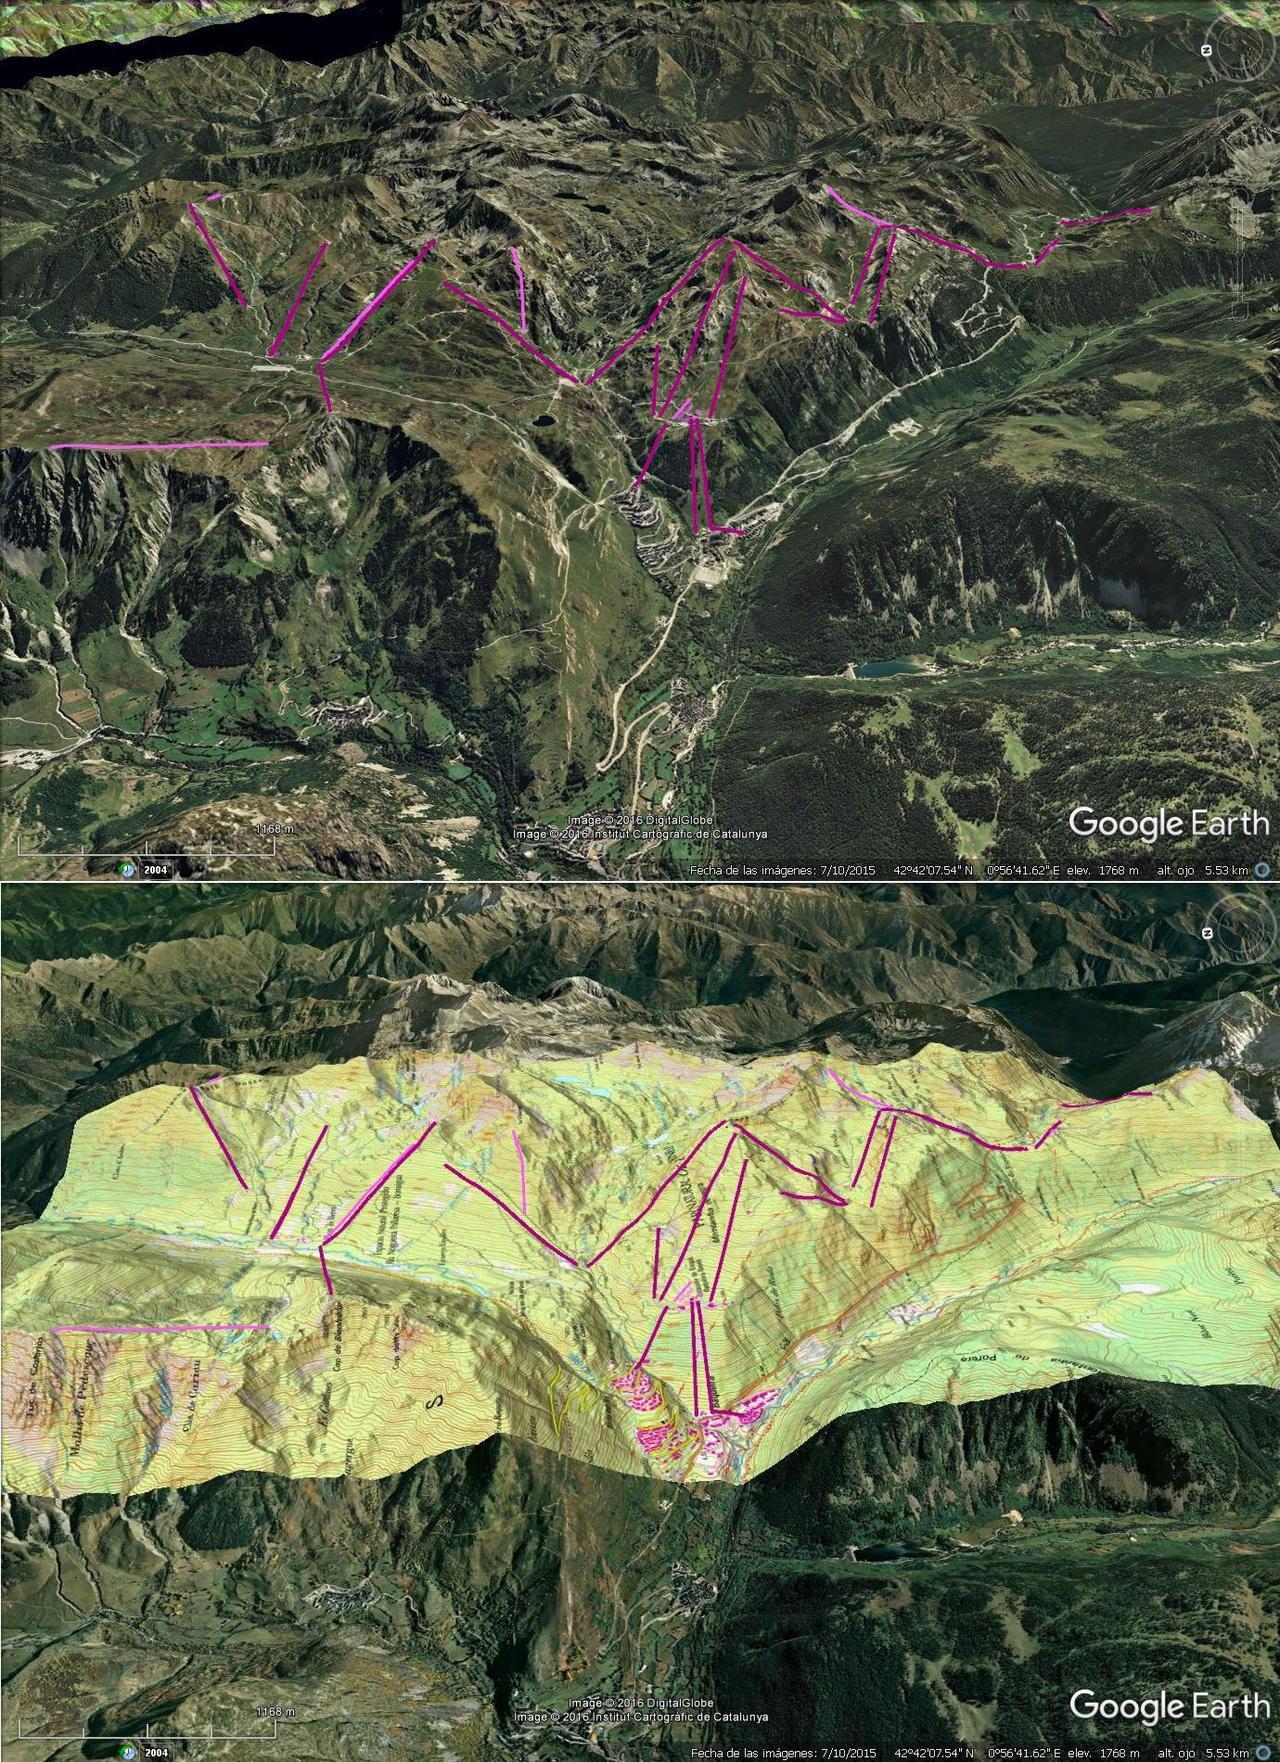 Vistas Google Earth Baqueira/Beret 2016-17